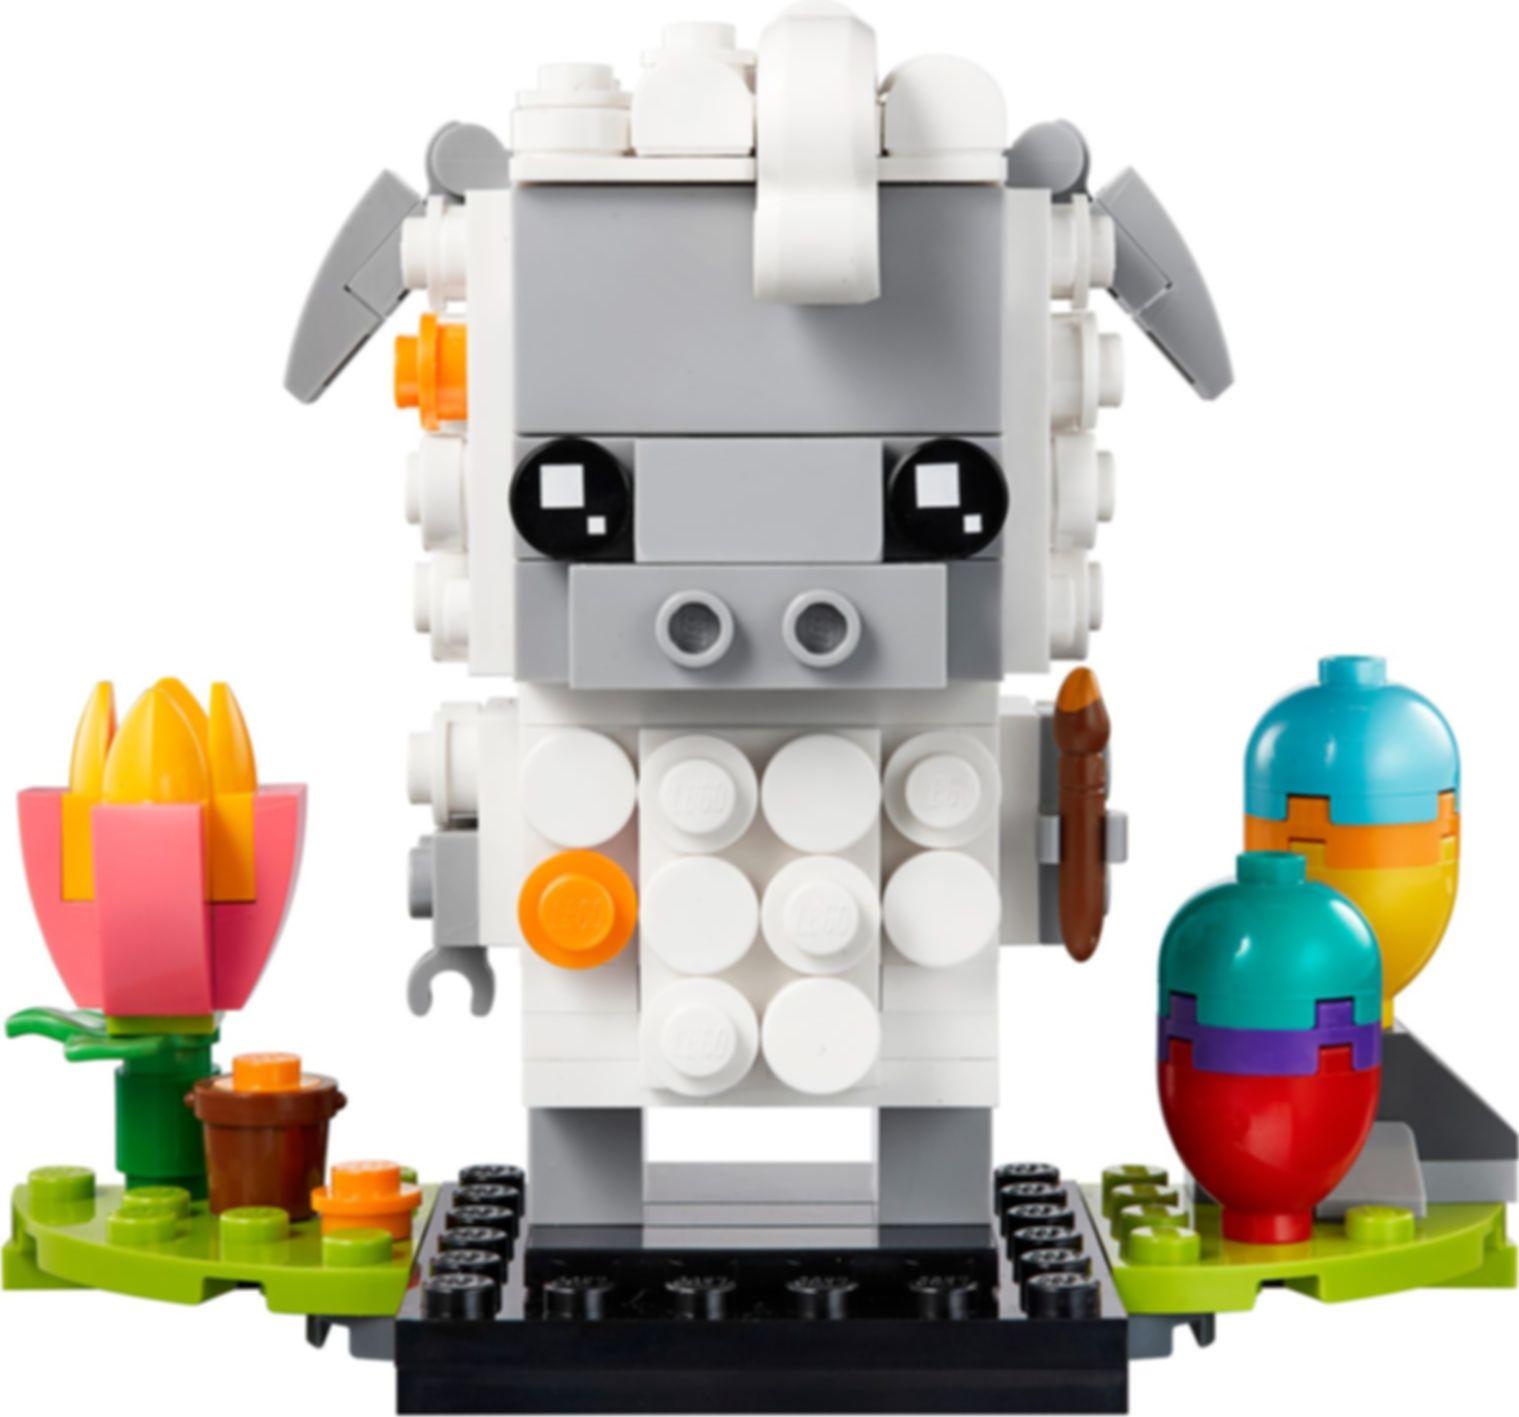 LEGO® BrickHeadz™ Easter Sheep components